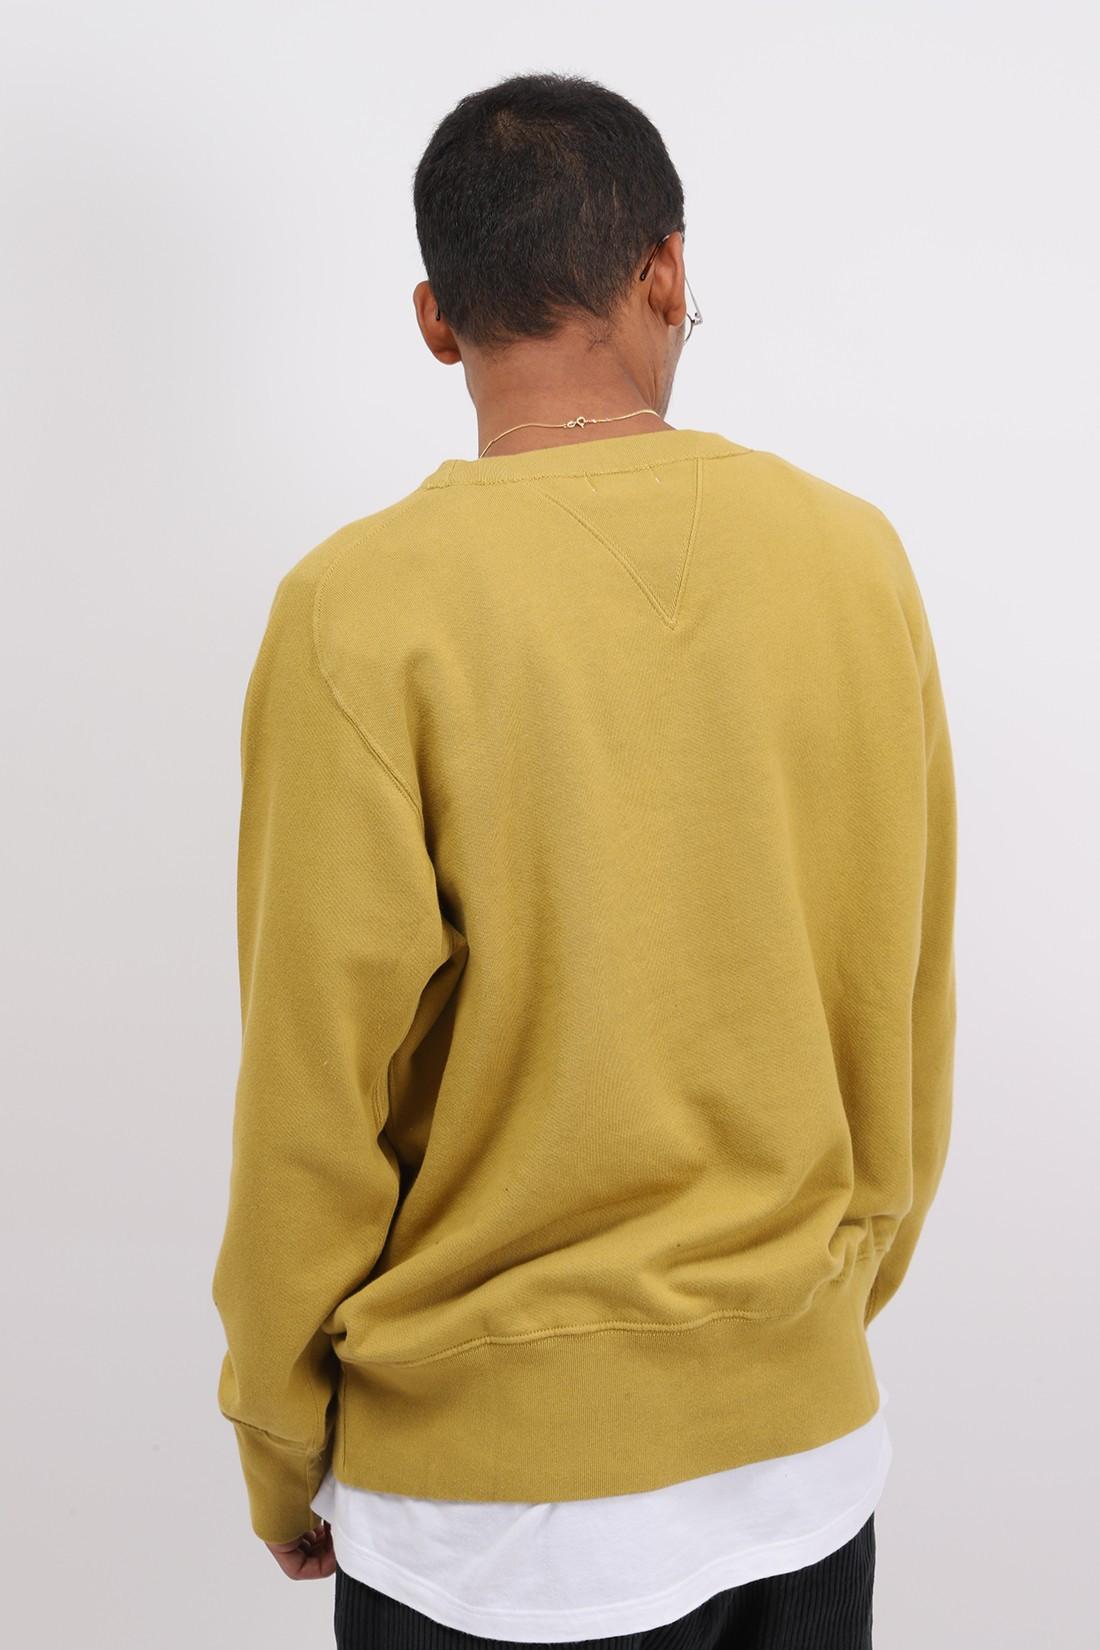 LEVI'S ® VINTAGE CLOTHING / Bay meadows sweatshirt Ecru olive